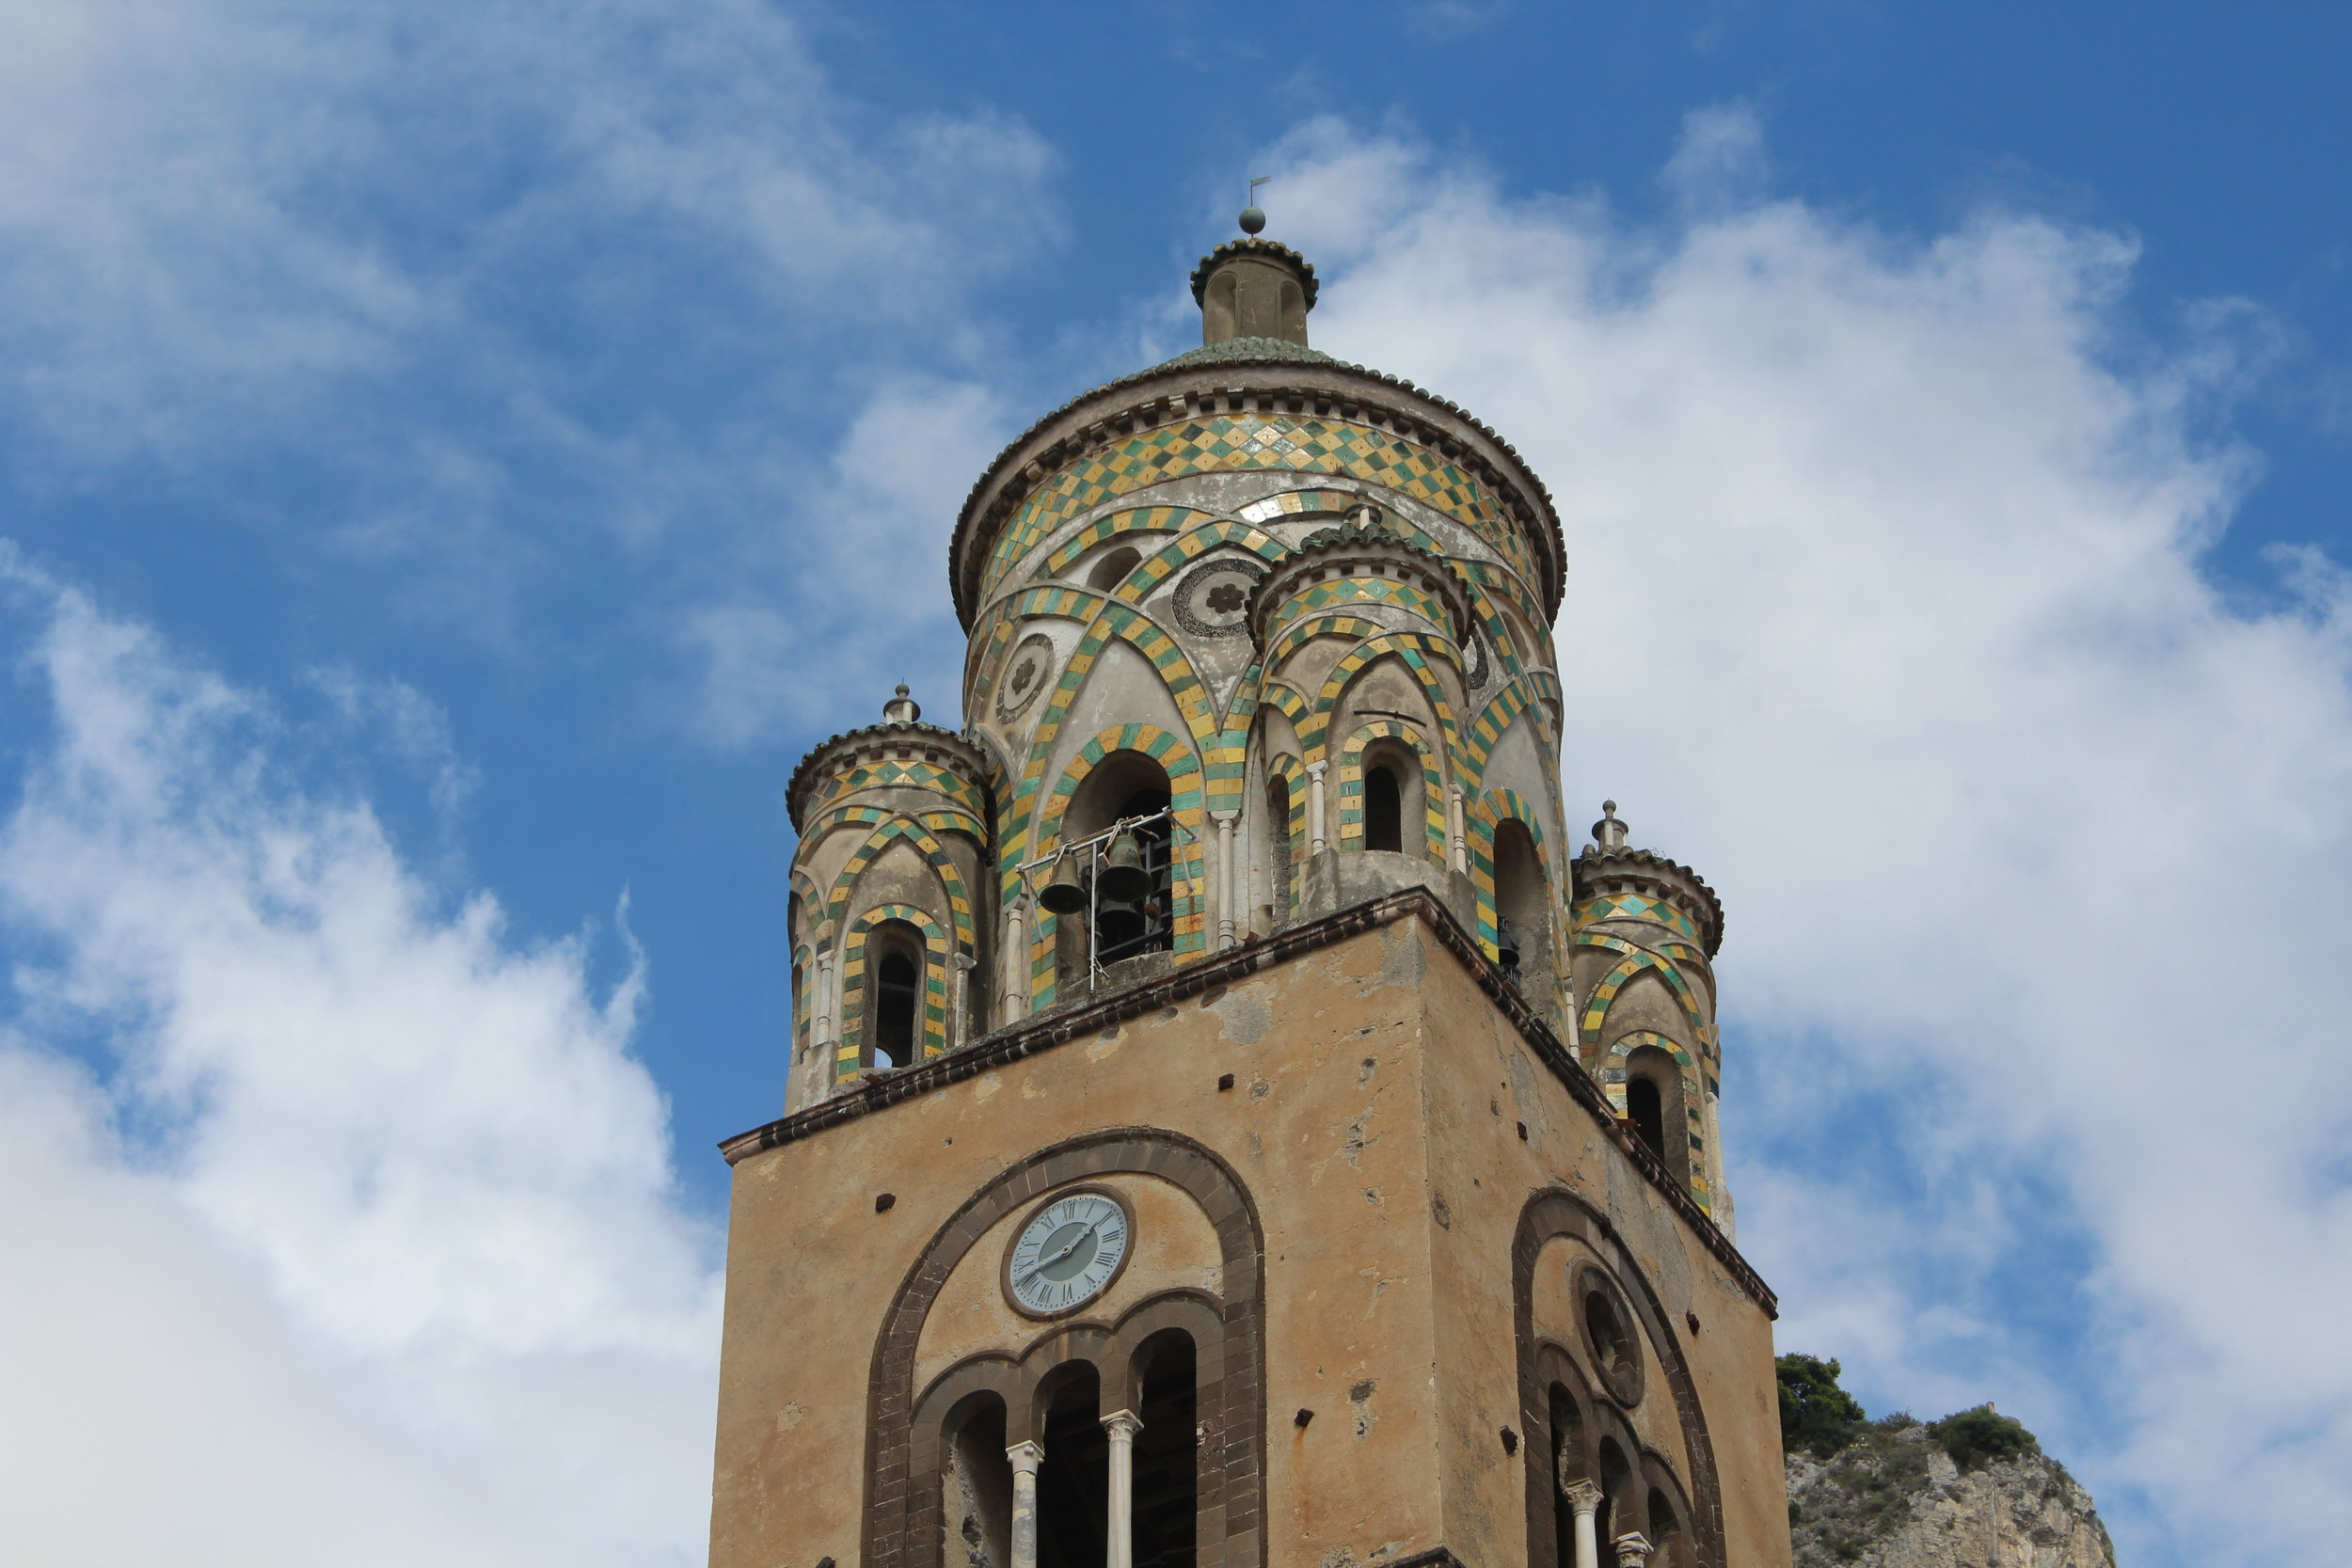 The Norman-Arab cathedral at Amalfi